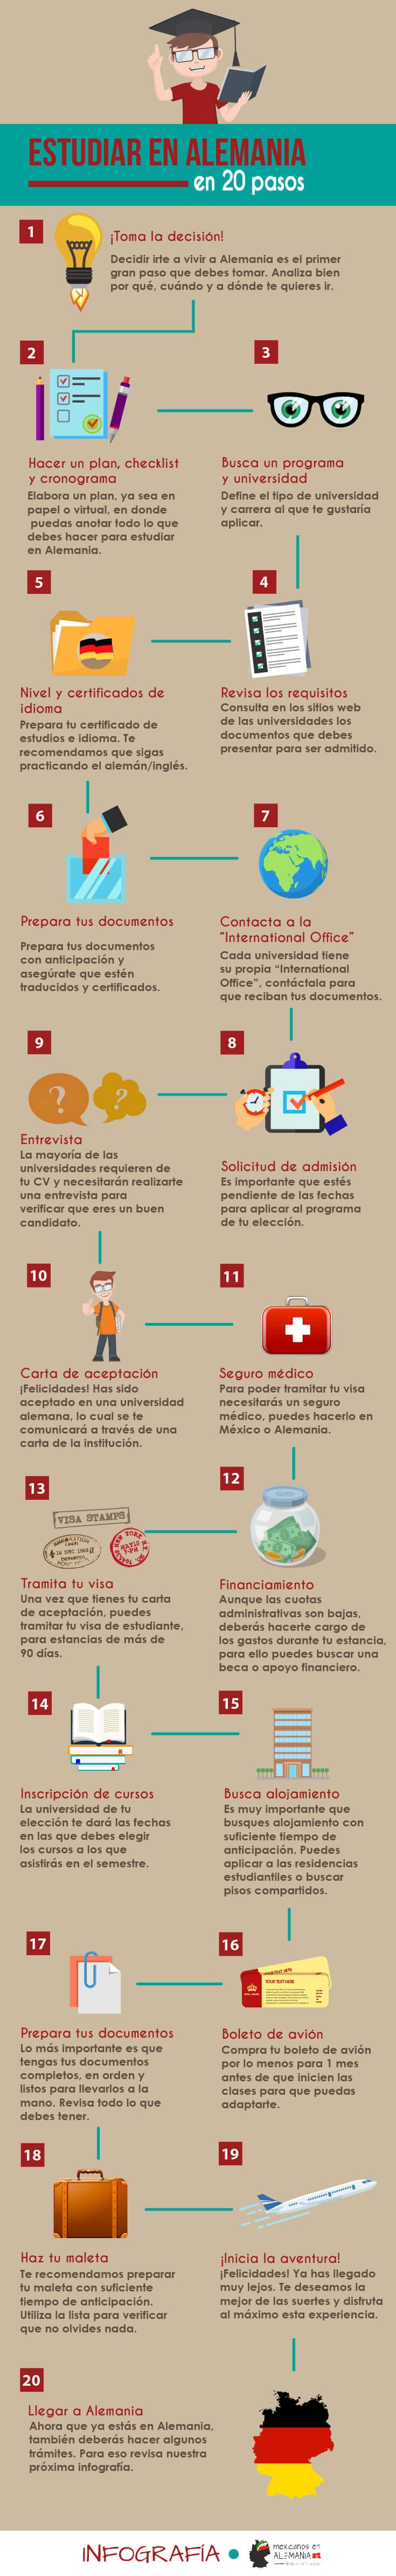 PasosEstudiarenAlemania-Infografia